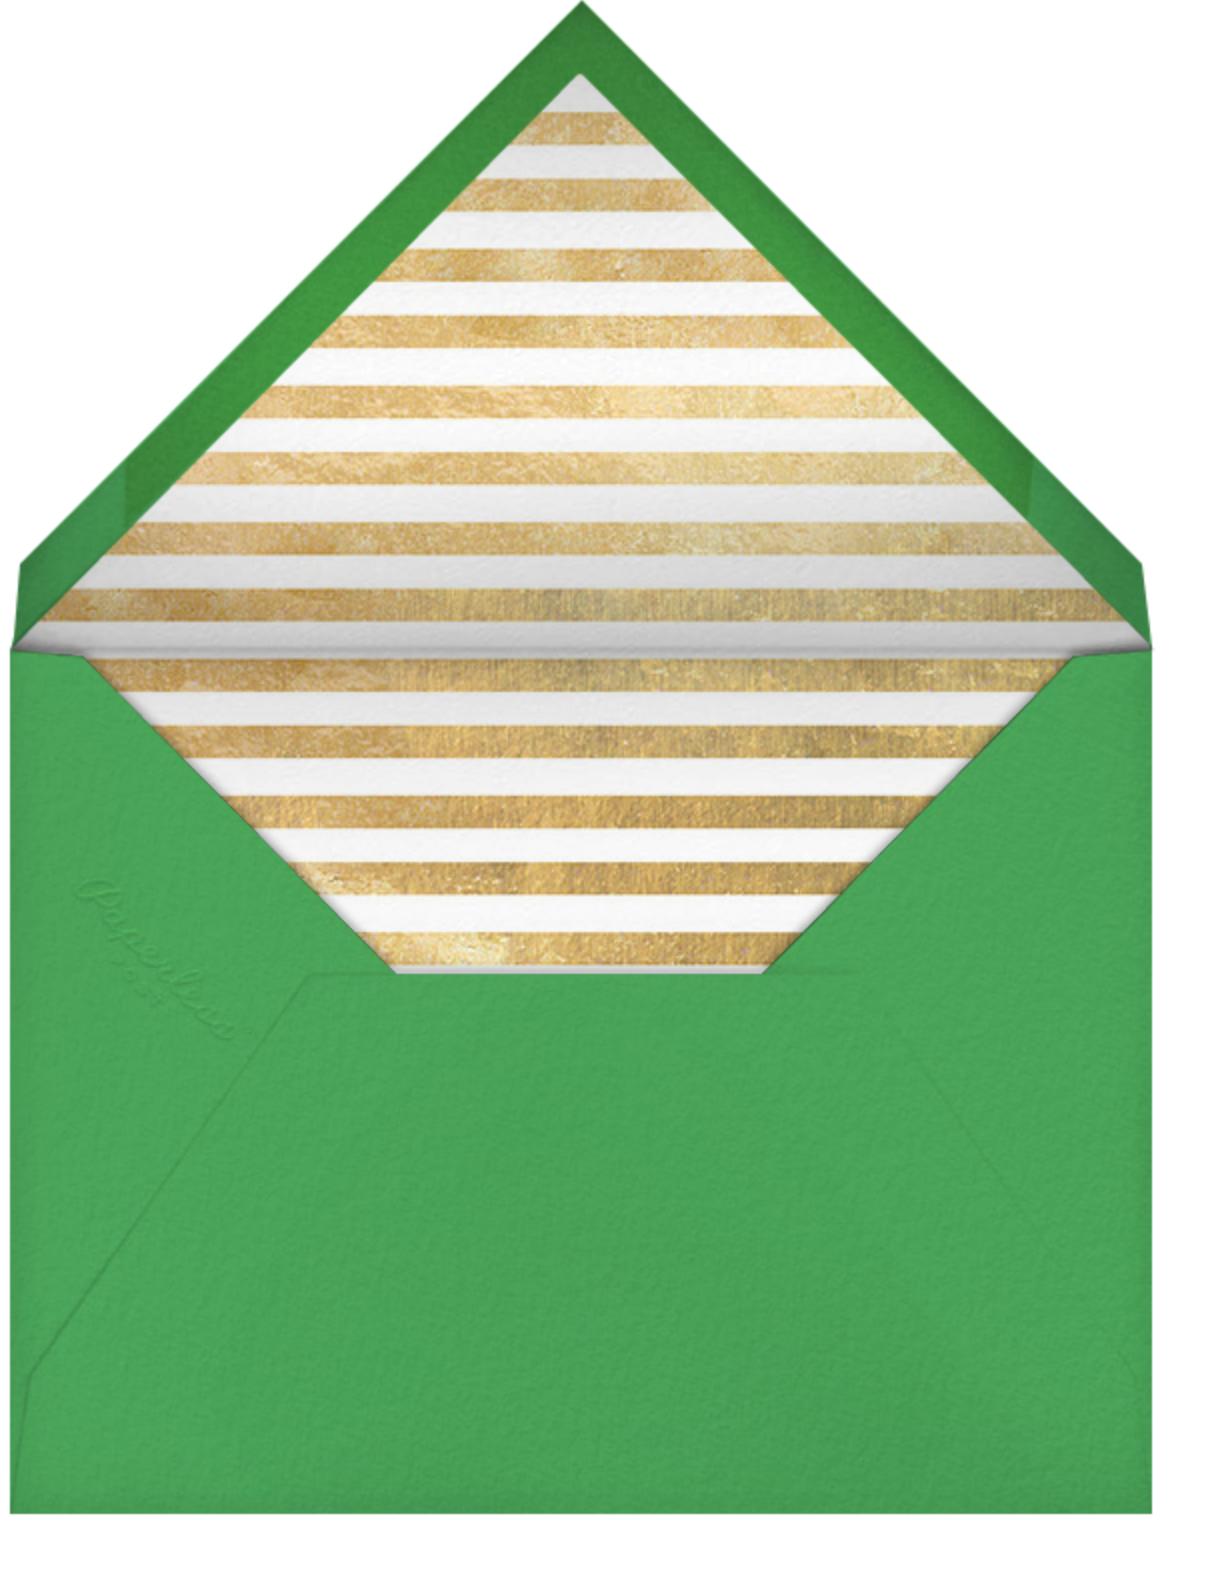 Tinsel Time (Greeting) - Silver - kate spade new york - null - envelope back